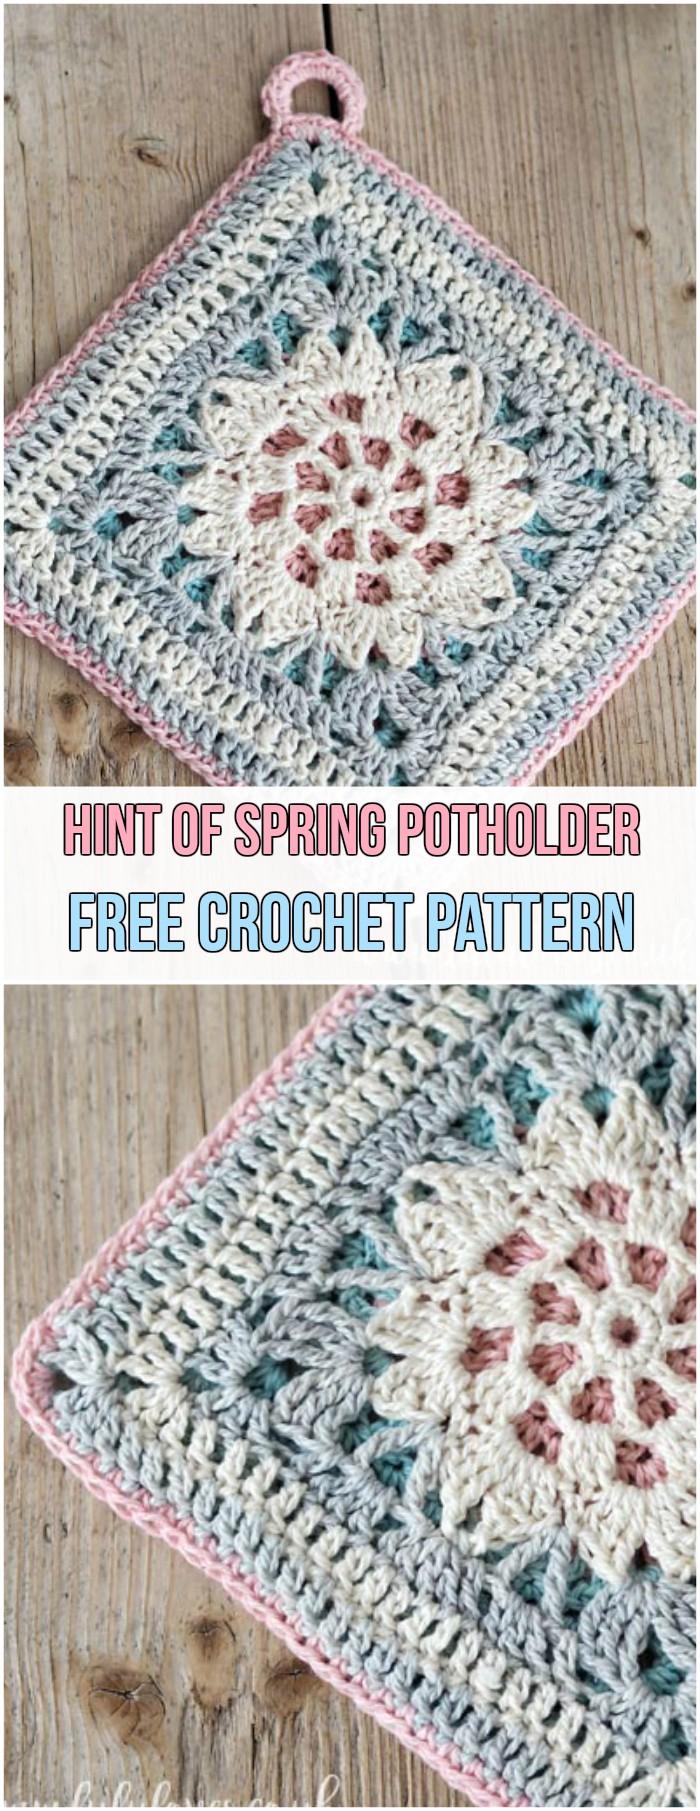 31 Amazing Free Crochet Potholder Patterns Crochetnstyle Com